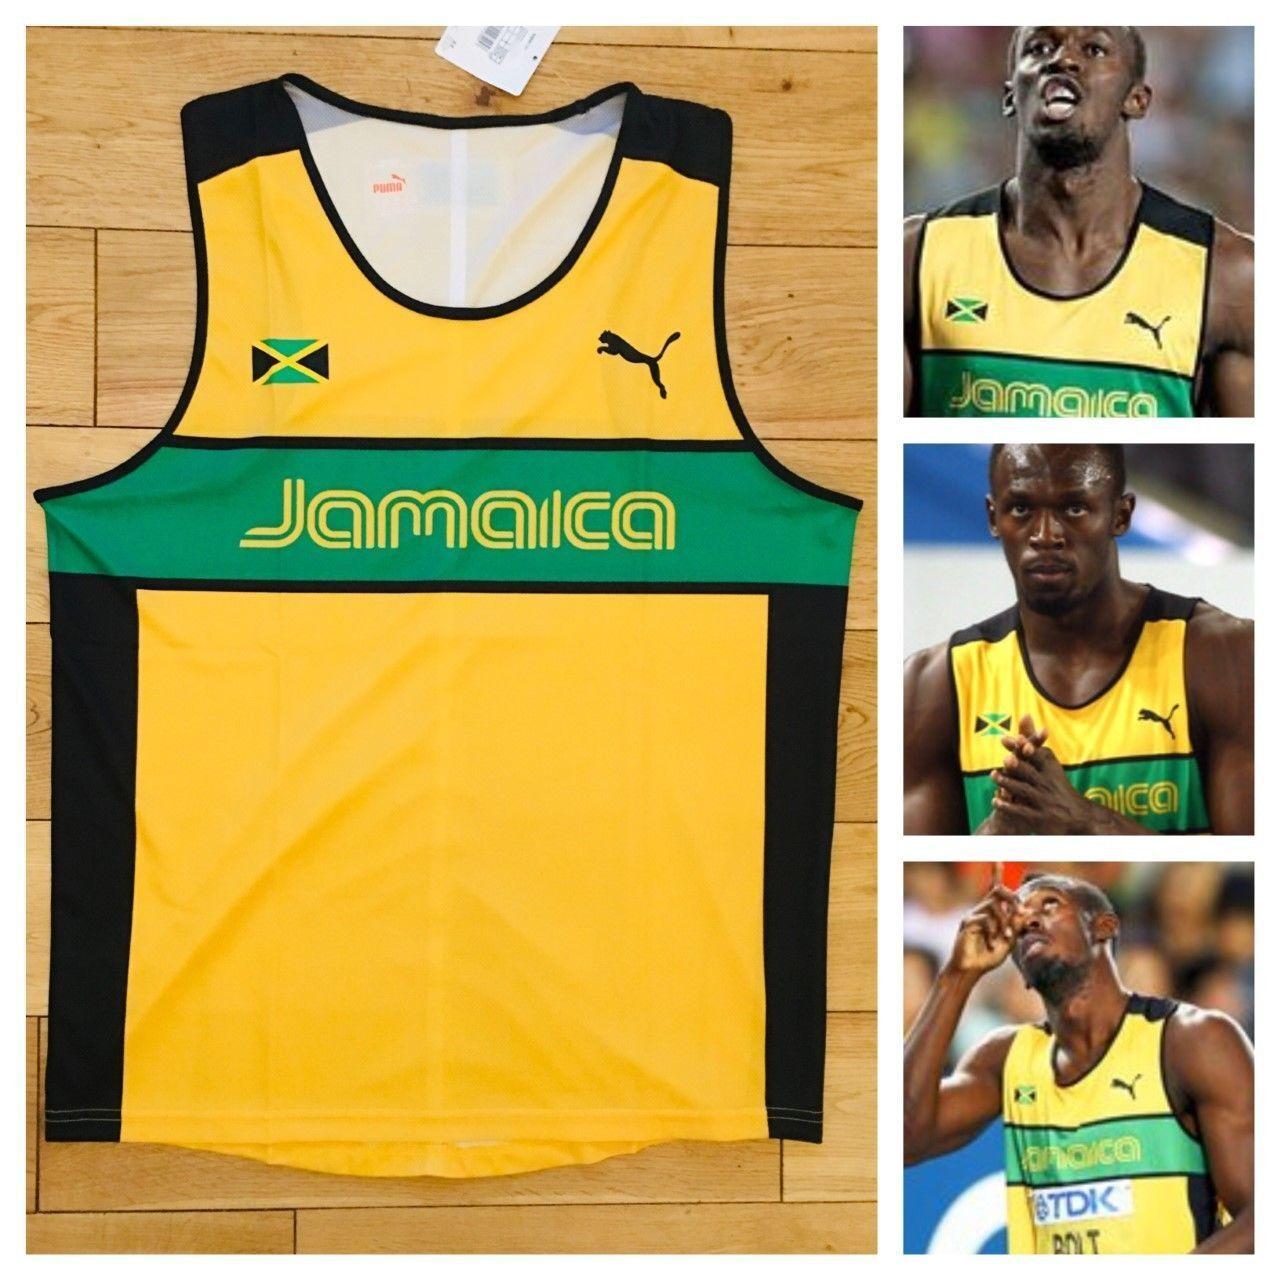 Puma Jamaica Men's Pro Elite 2011 Running Singlet Vest Top Usain Bolt New Rare